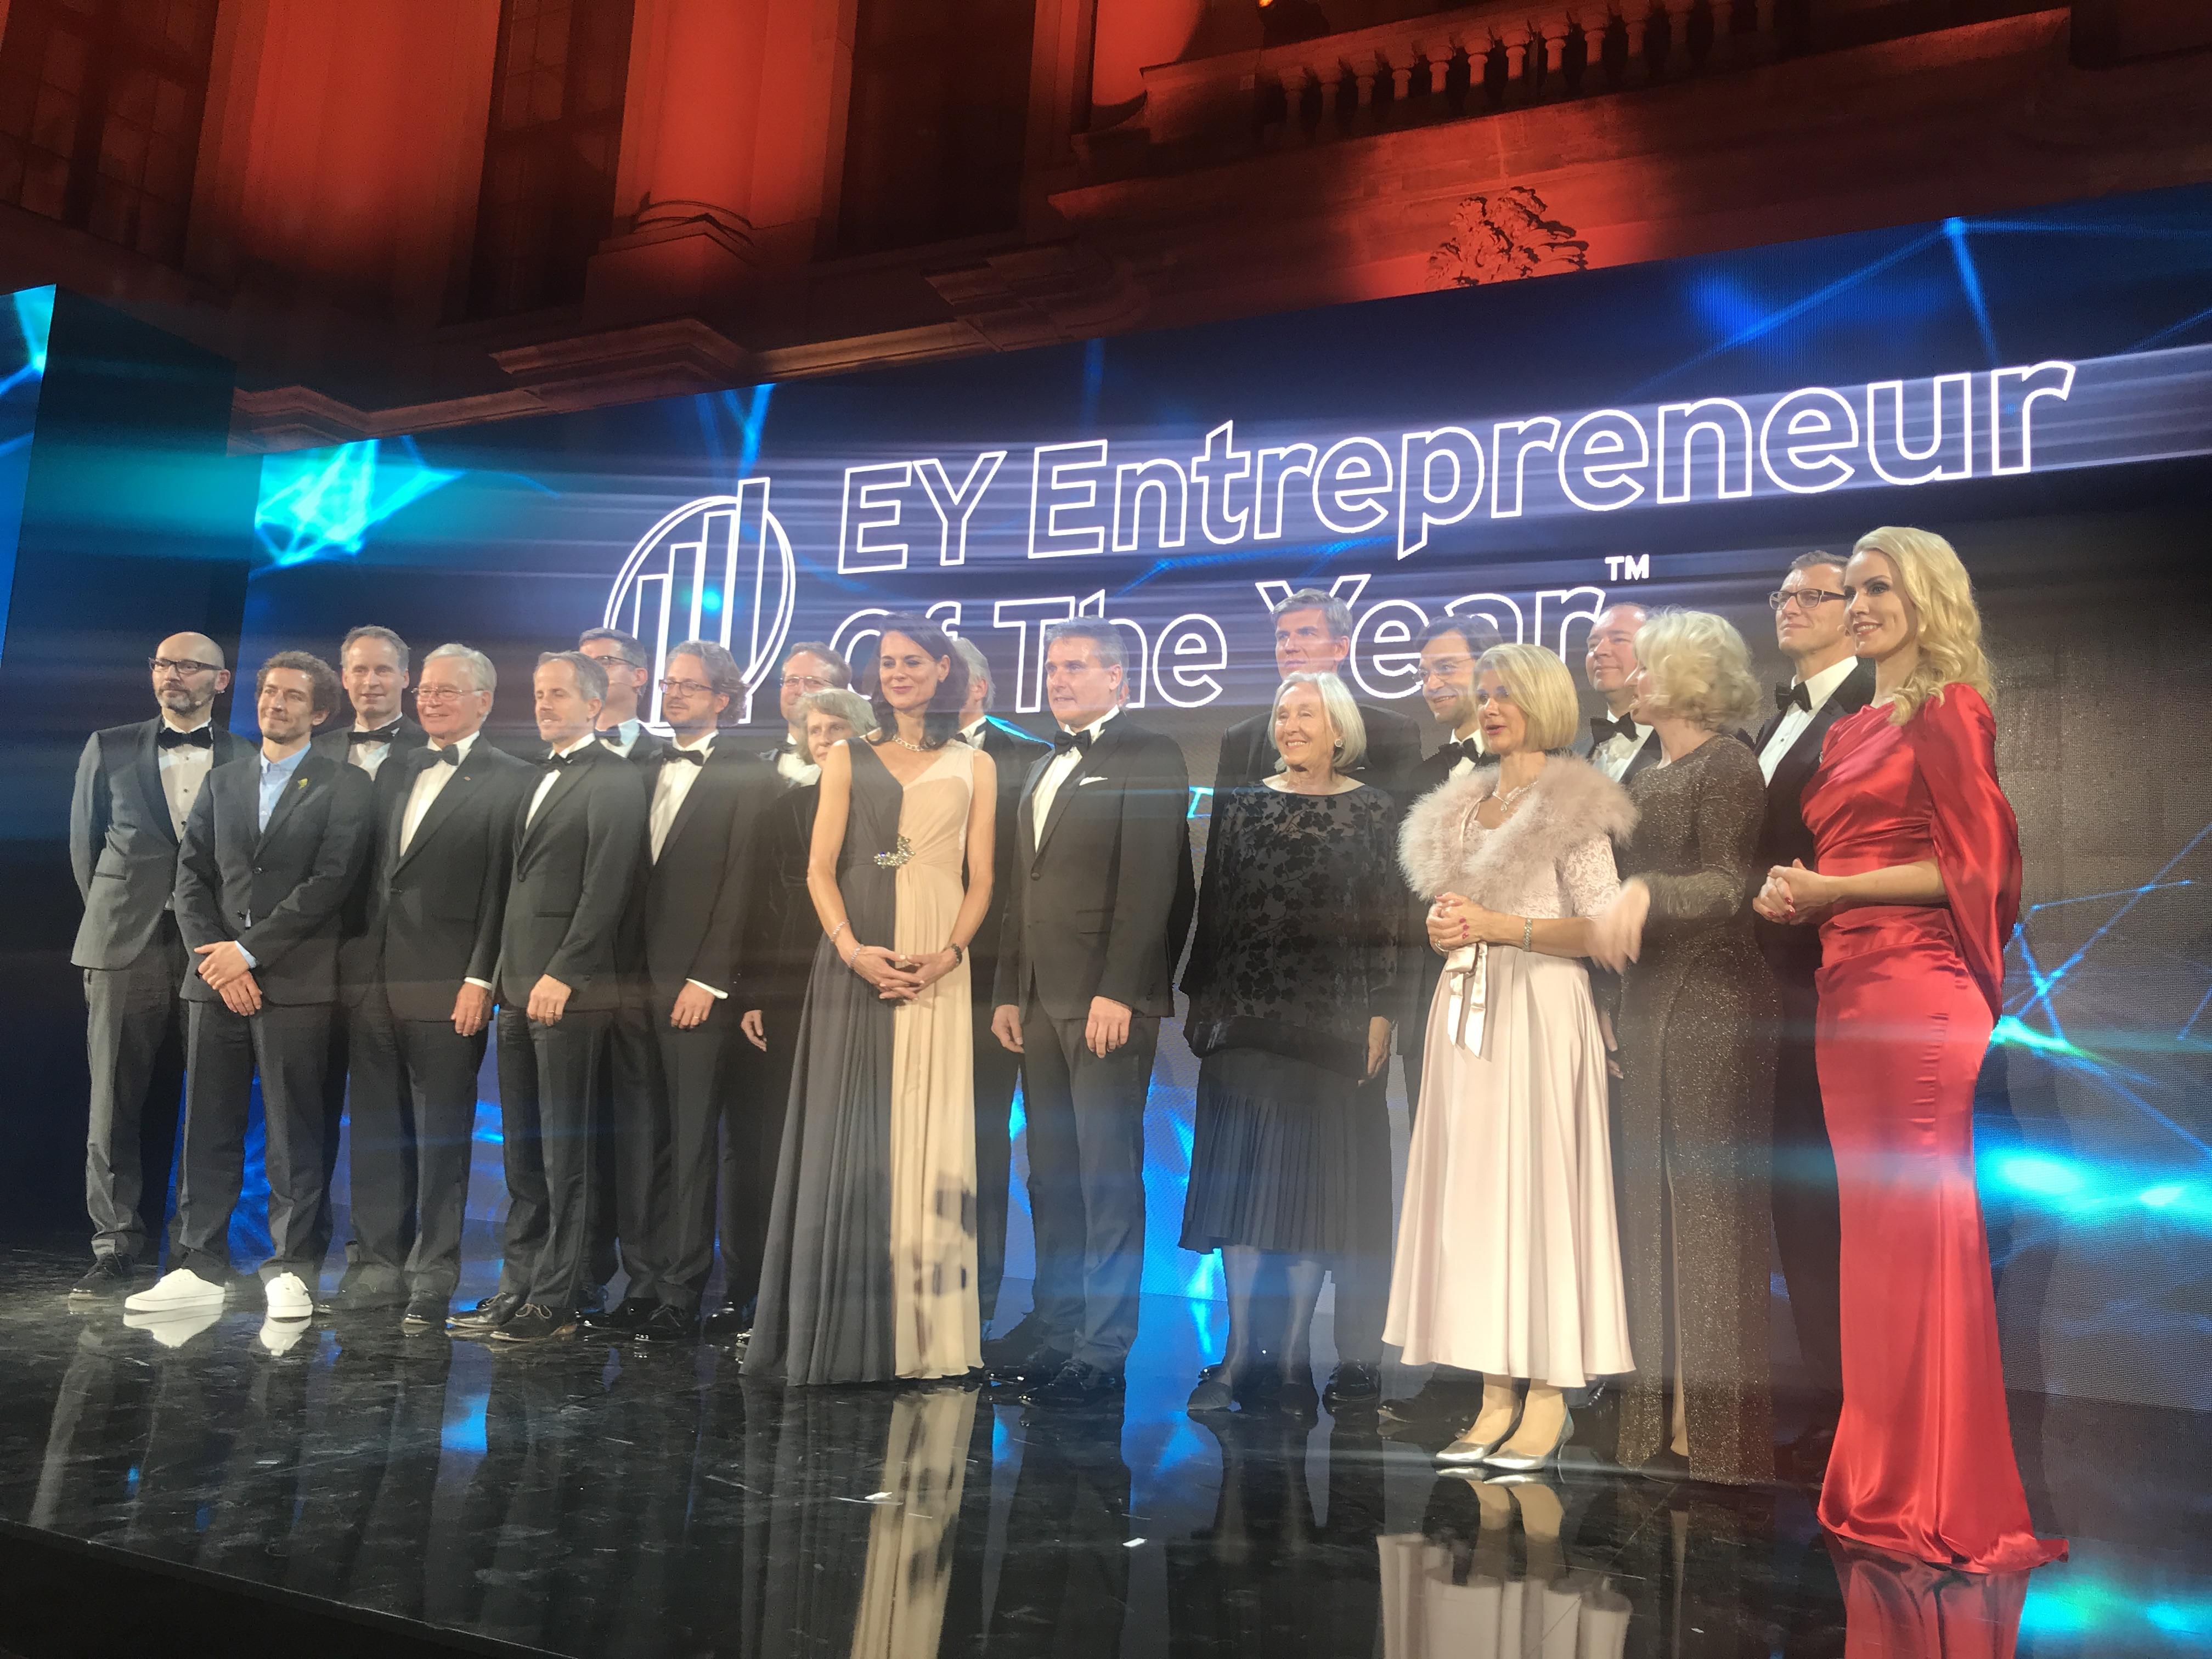 Die Preisträger bei der EY Entrepreneur of the Year Preisverleihung